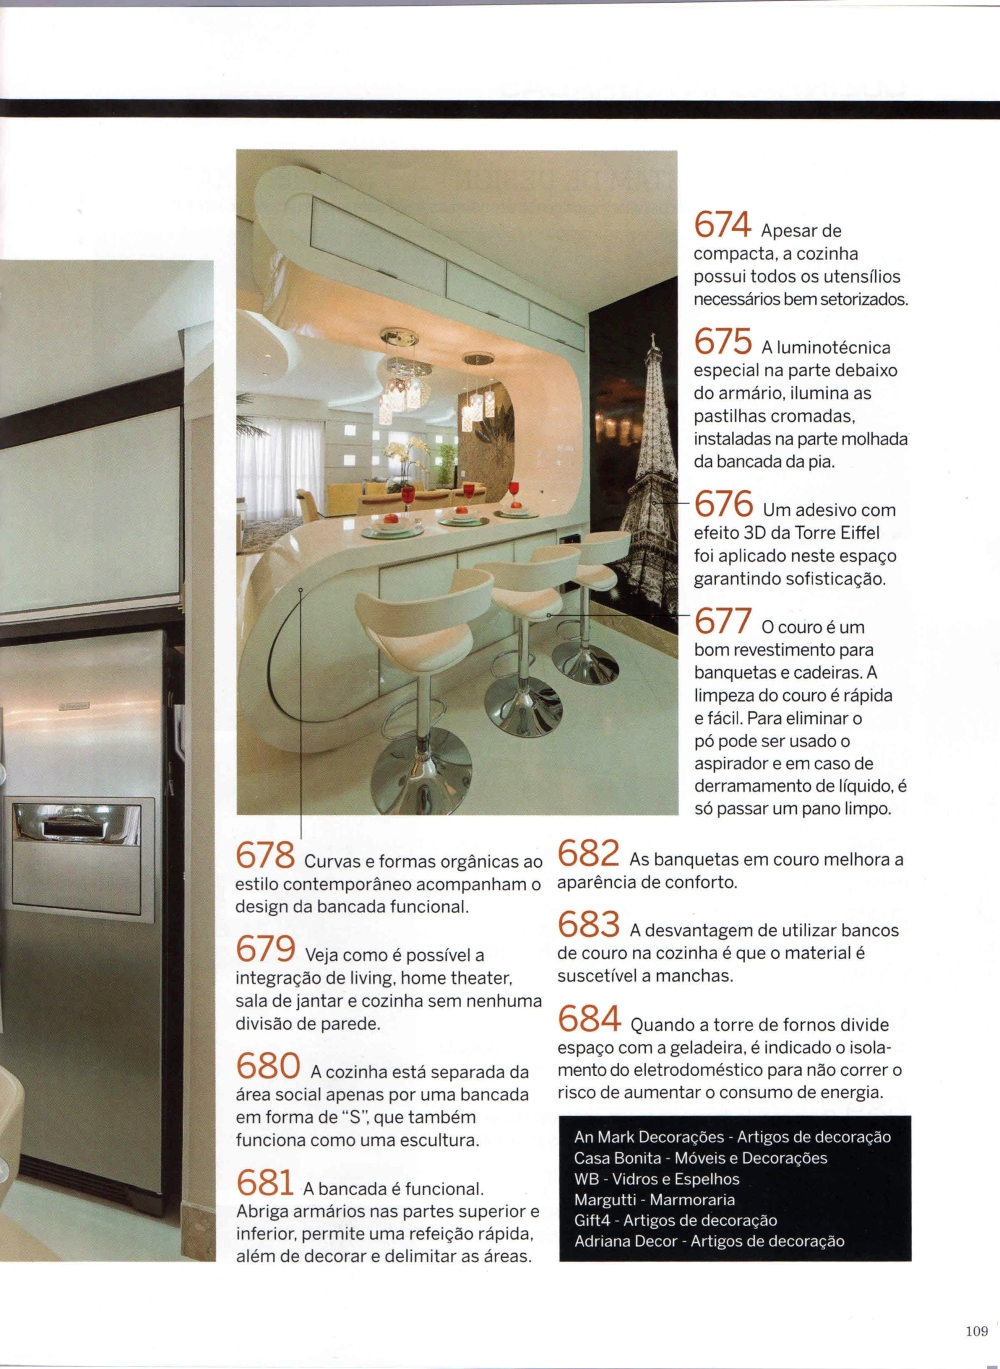 Arquiteto Aquiles Nicolas Kilaris Revista Guia 1001 ideias (13)